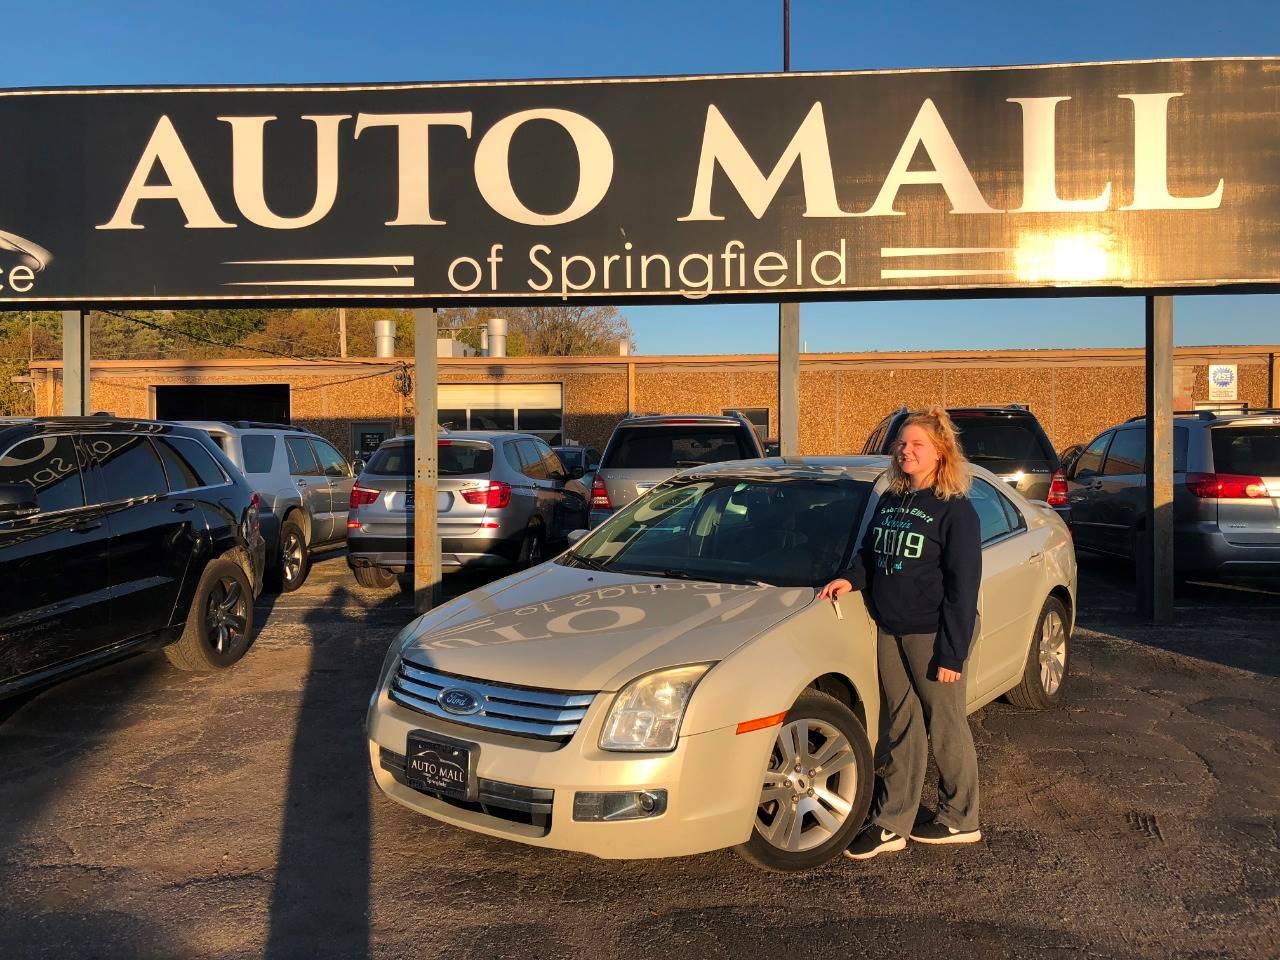 Auto Mall Springfield Il >> Auto Mall of Springfield - Springfield IL - Customer Testimonials